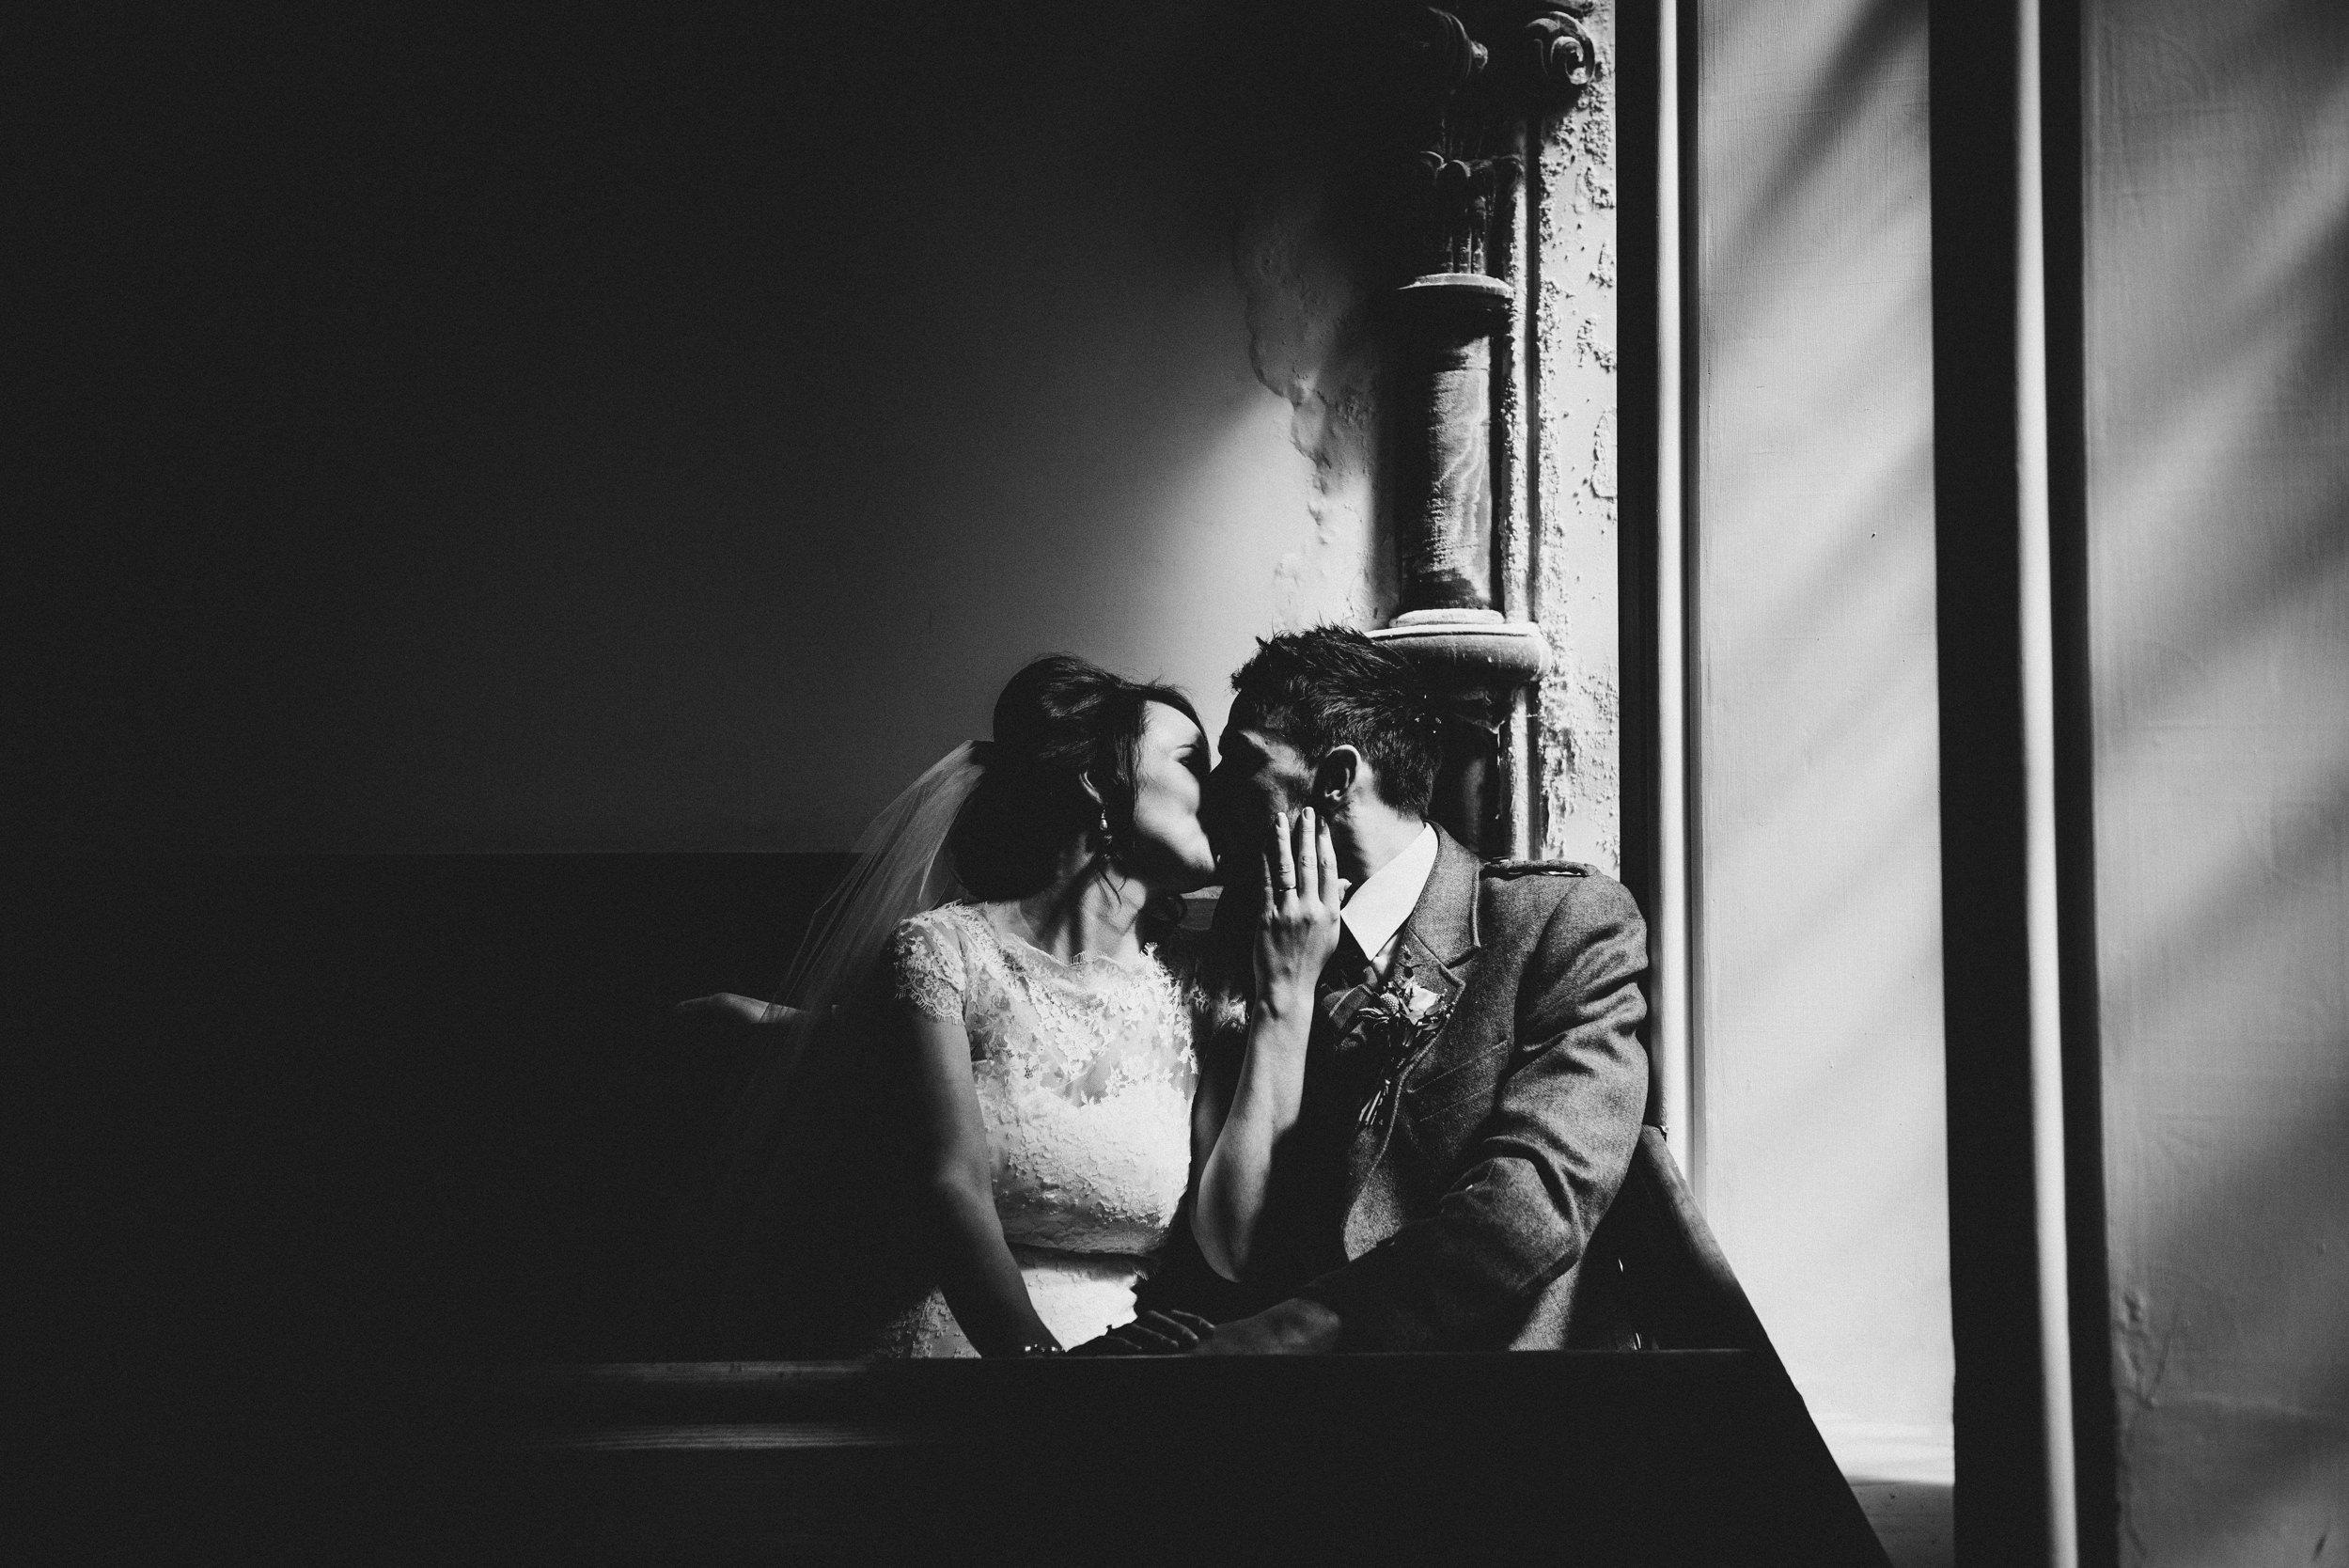 0037-alternative-wedding-portrait-family-kids-photographer-glasgow-scotland.JPG